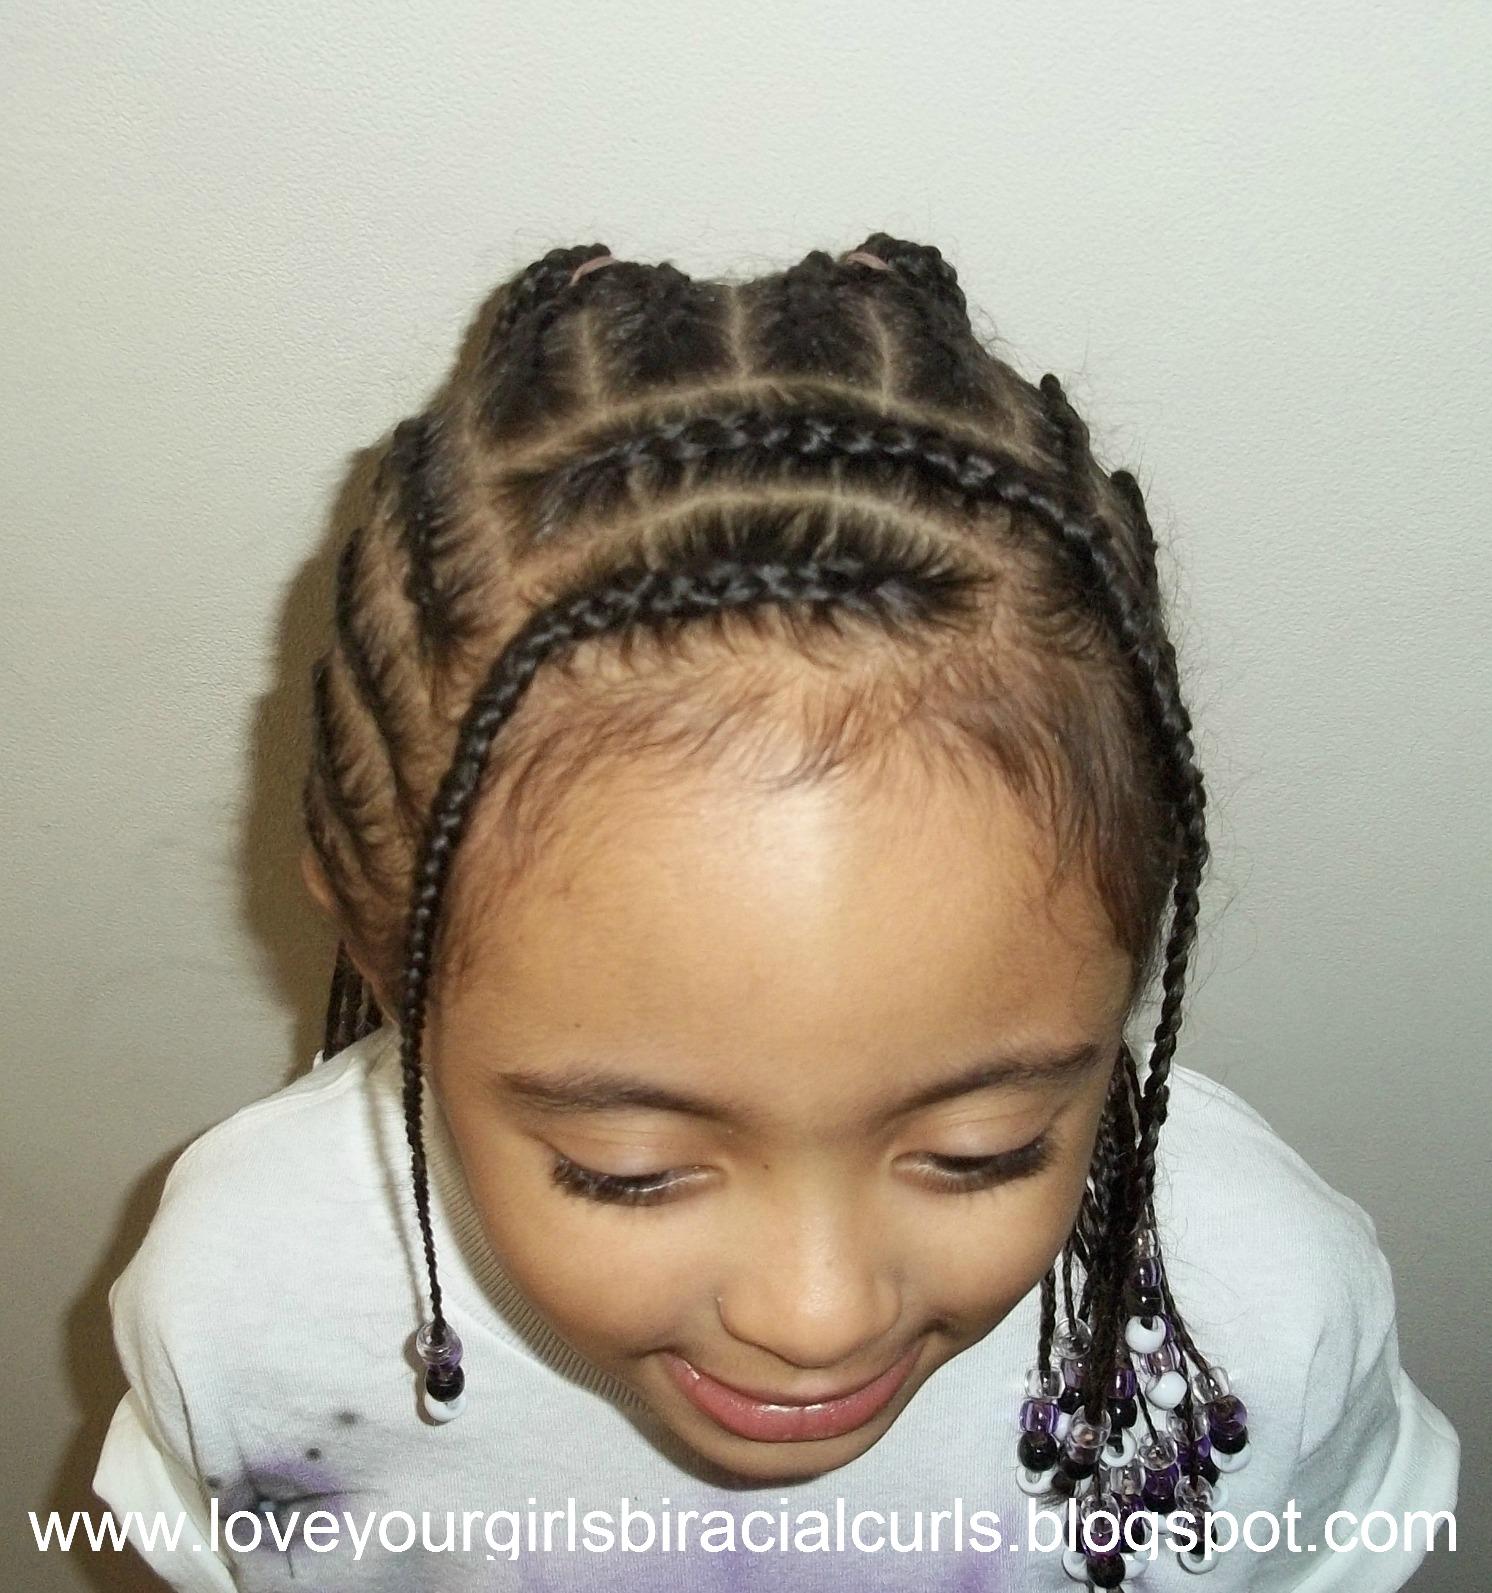 Hairstyles Mixed Hair : Biracial Girls Hair Styles newhairstylesformen2014.com